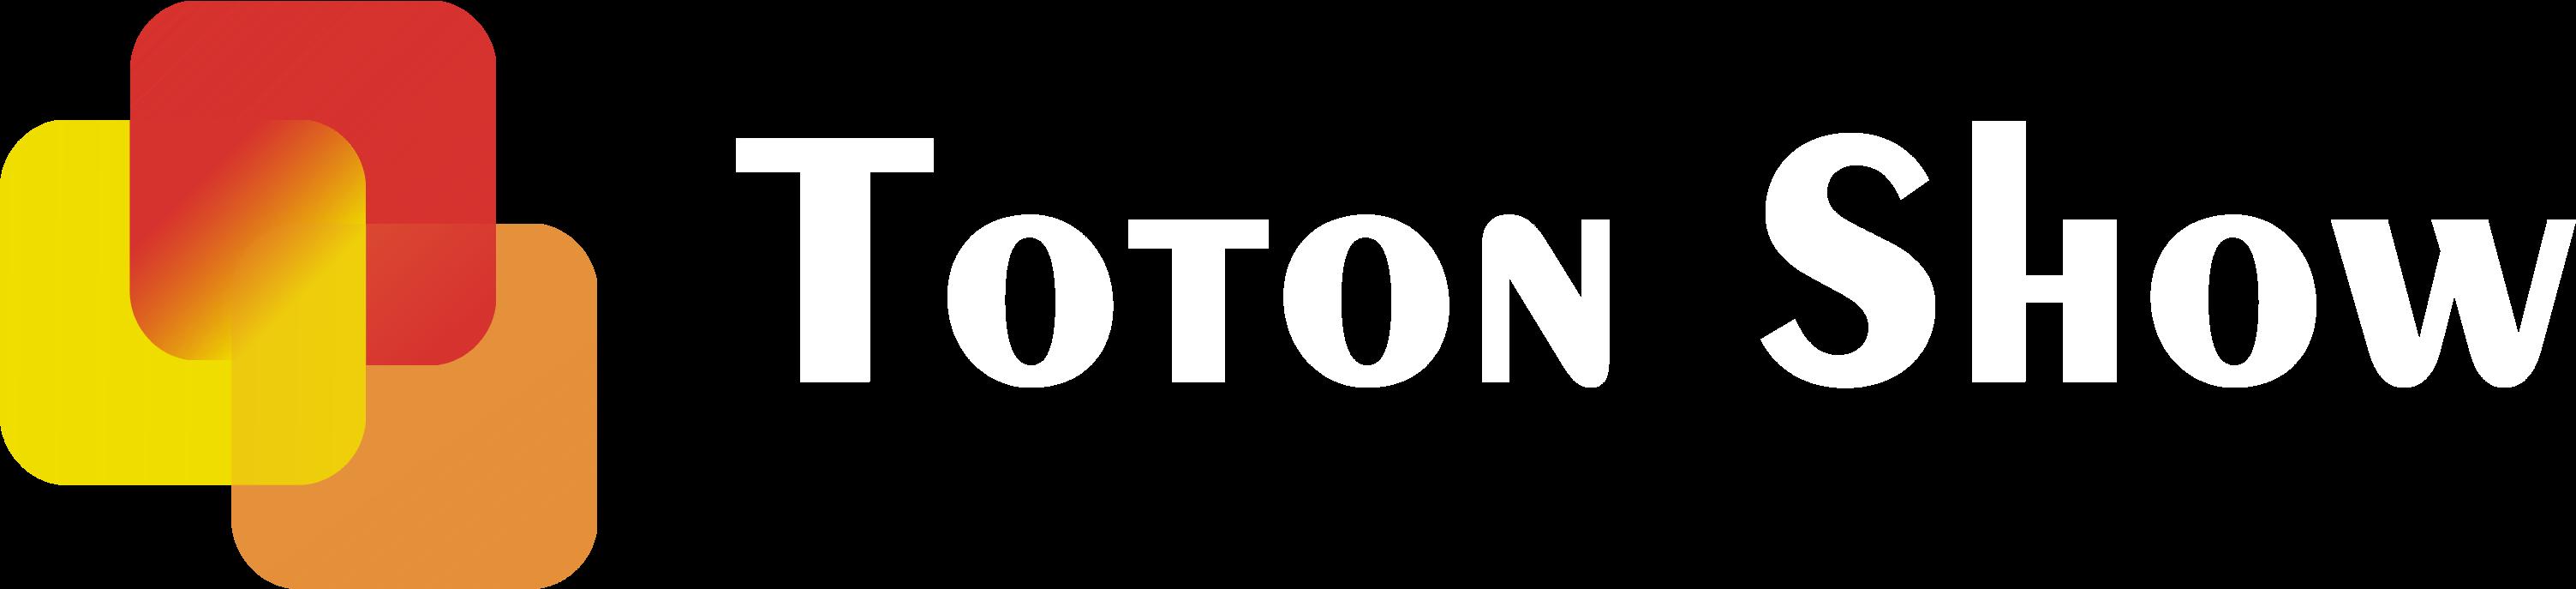 Toton Show